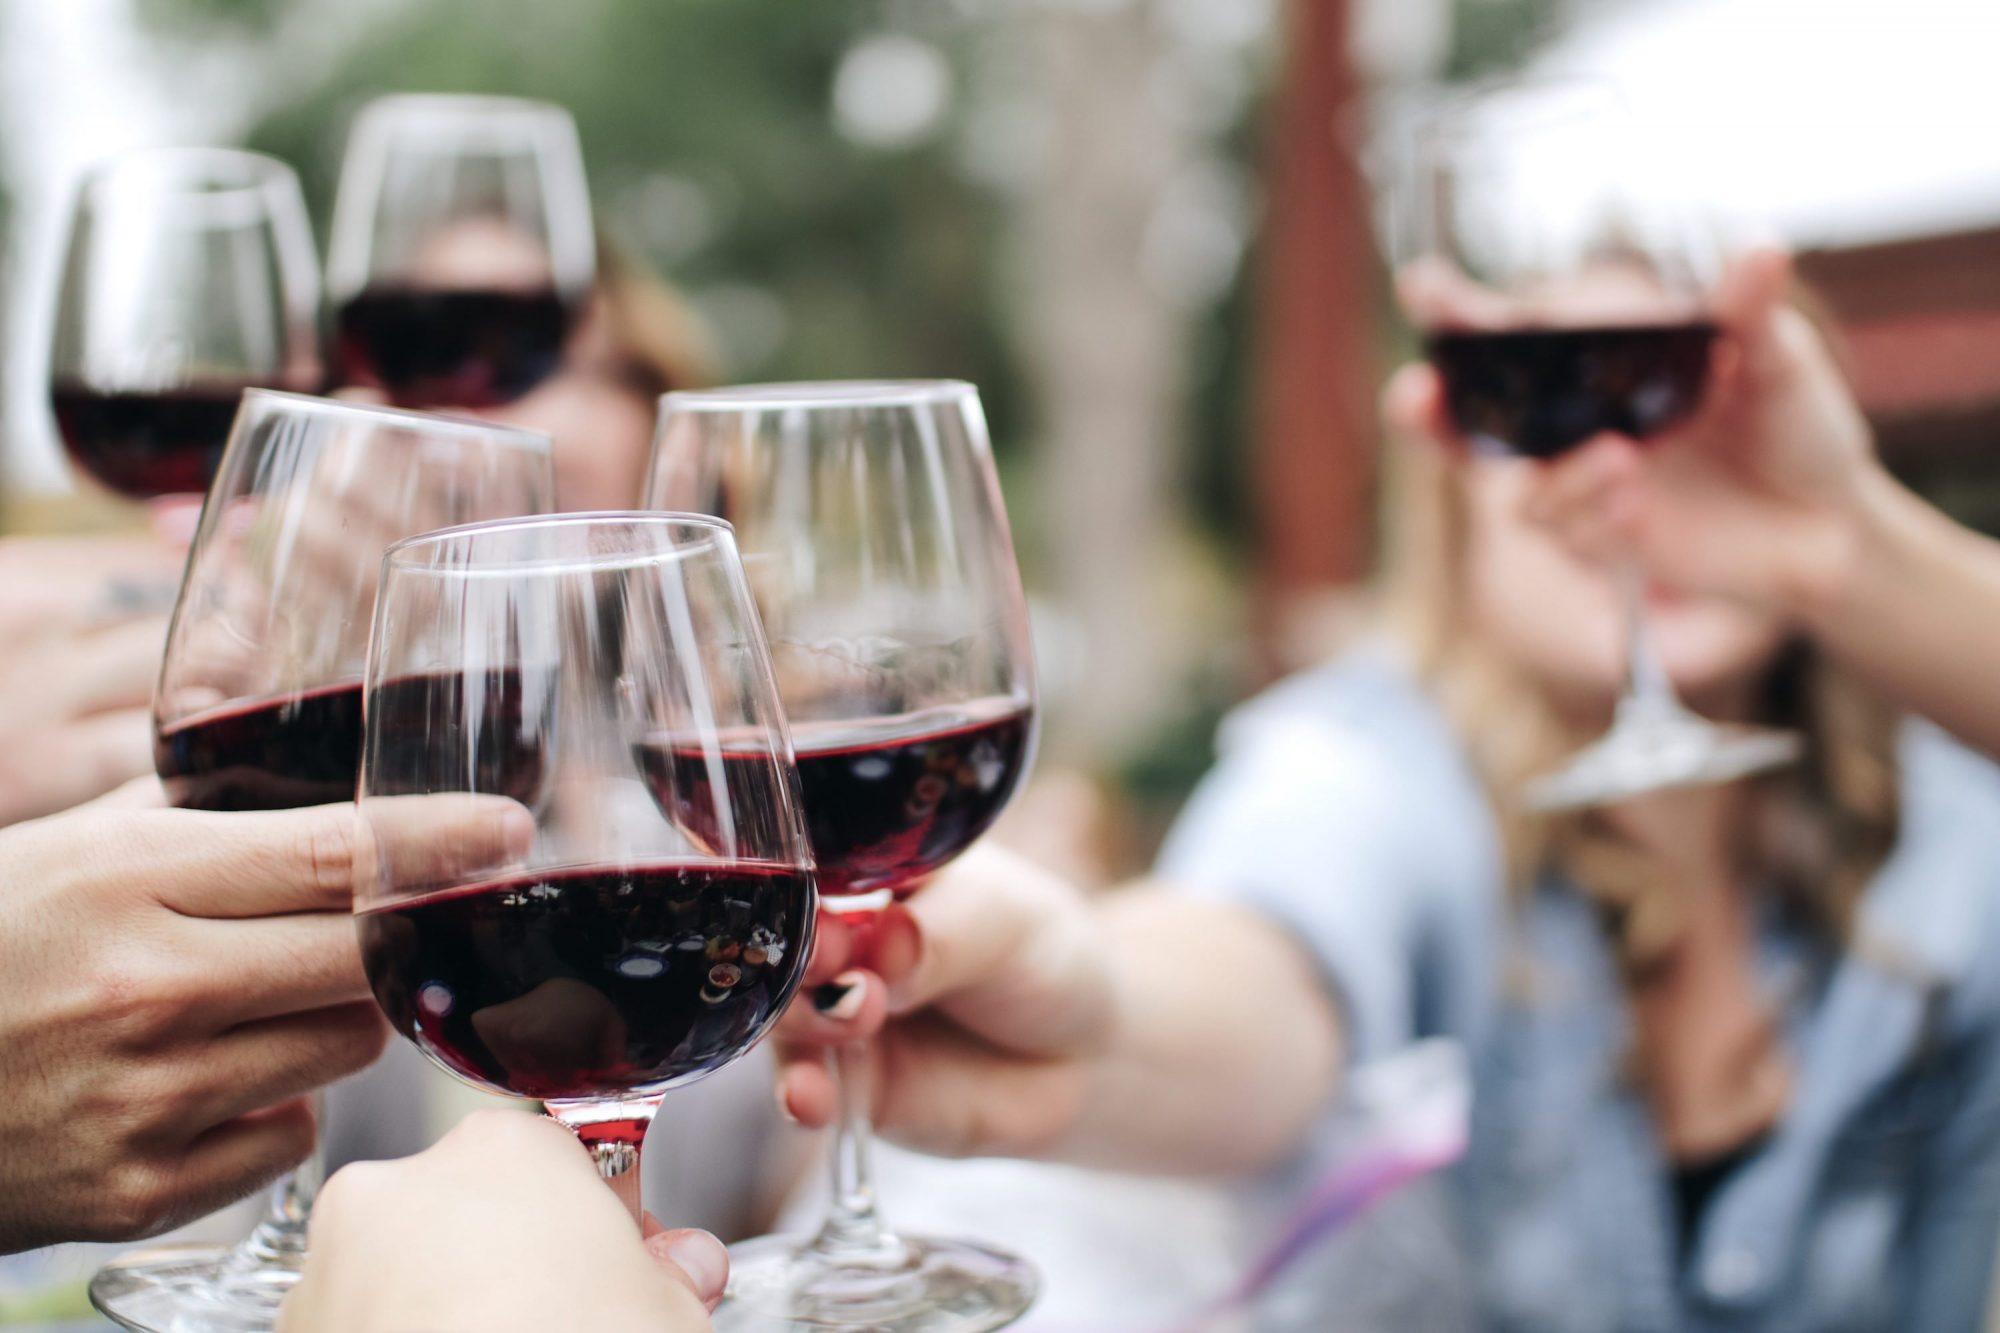 Vins millesime wine